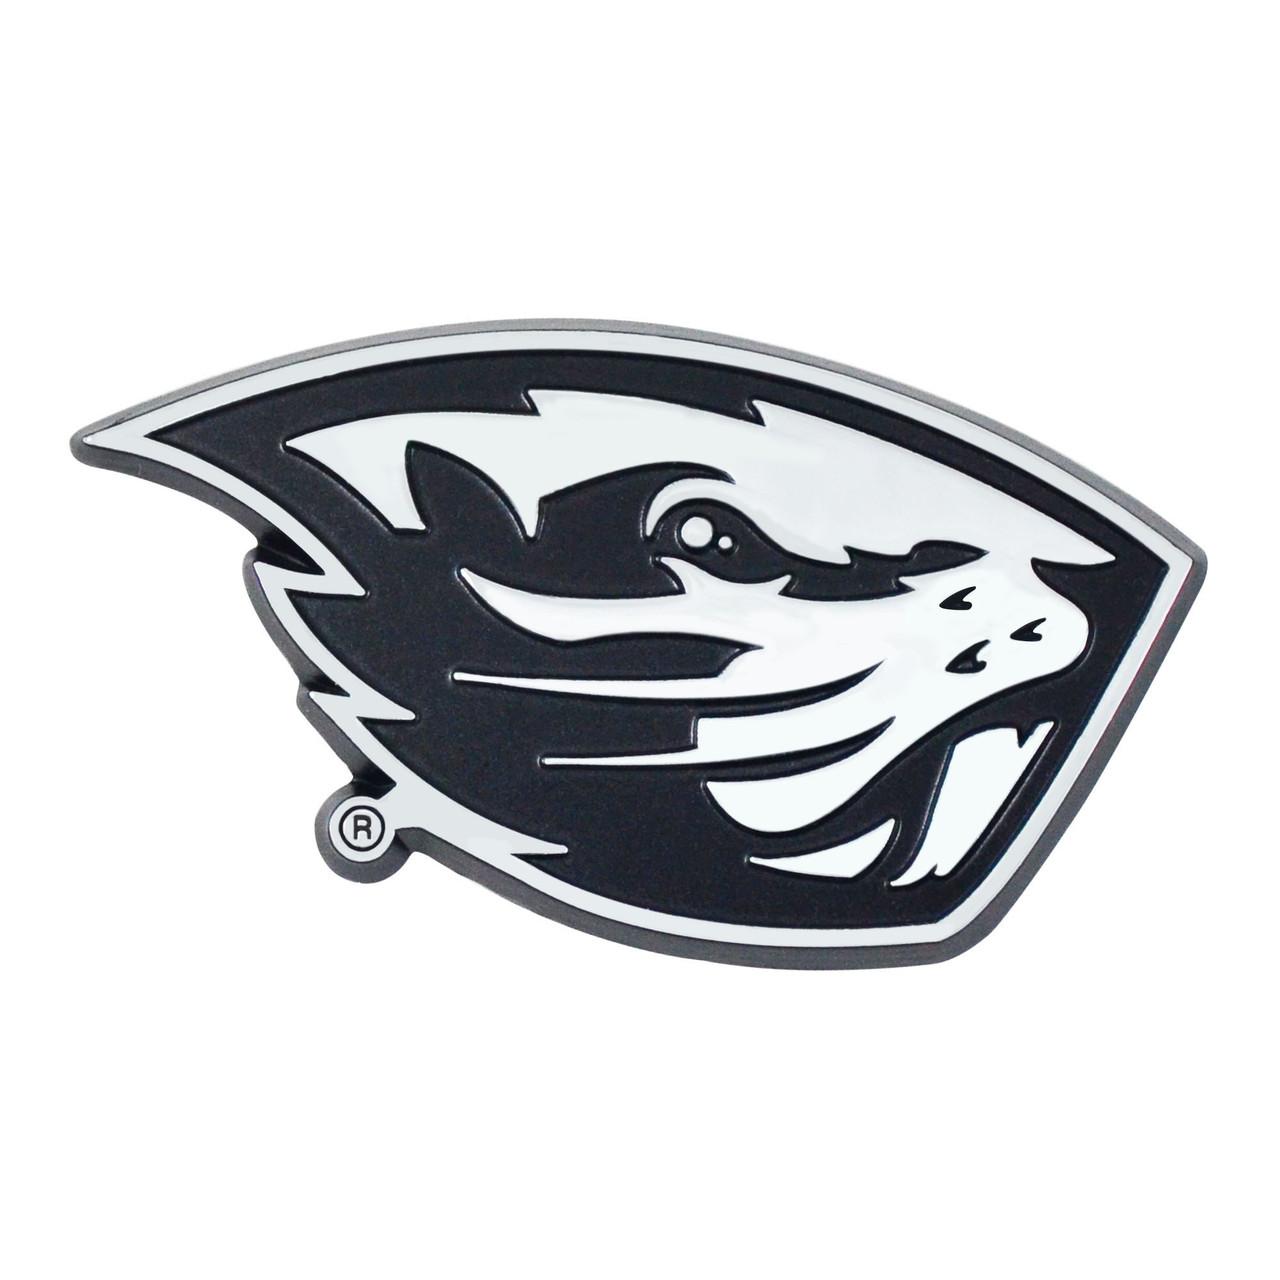 Oregon State Beavers Auto Emblem Premium Metal Chrome Special Order